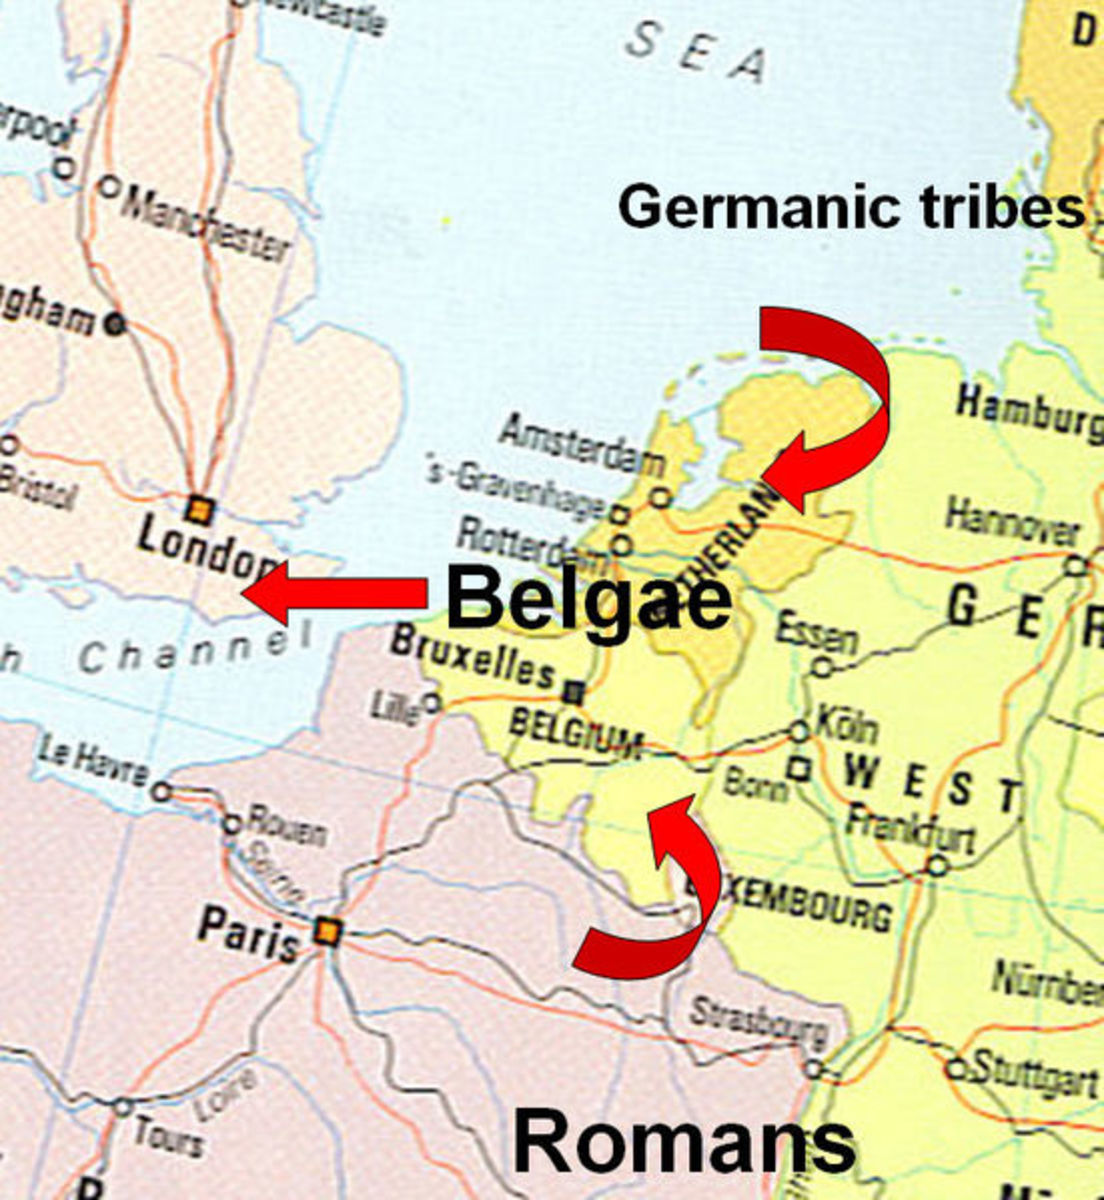 Anti-Roman factions of the Belgae flee to Britain.